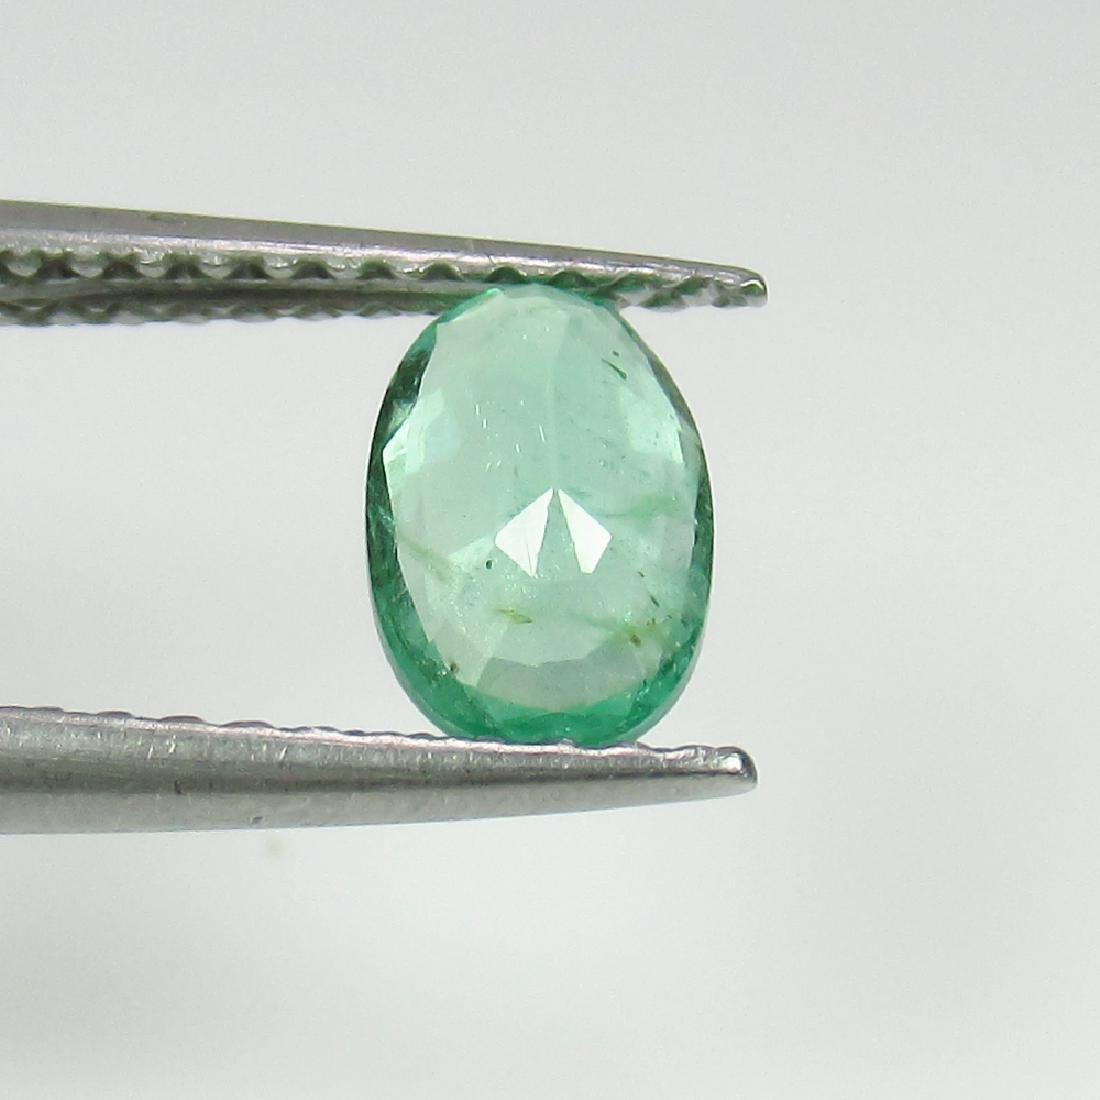 0.56 Ct Genuine Zambian Emerald Nice Oval Cut - 2